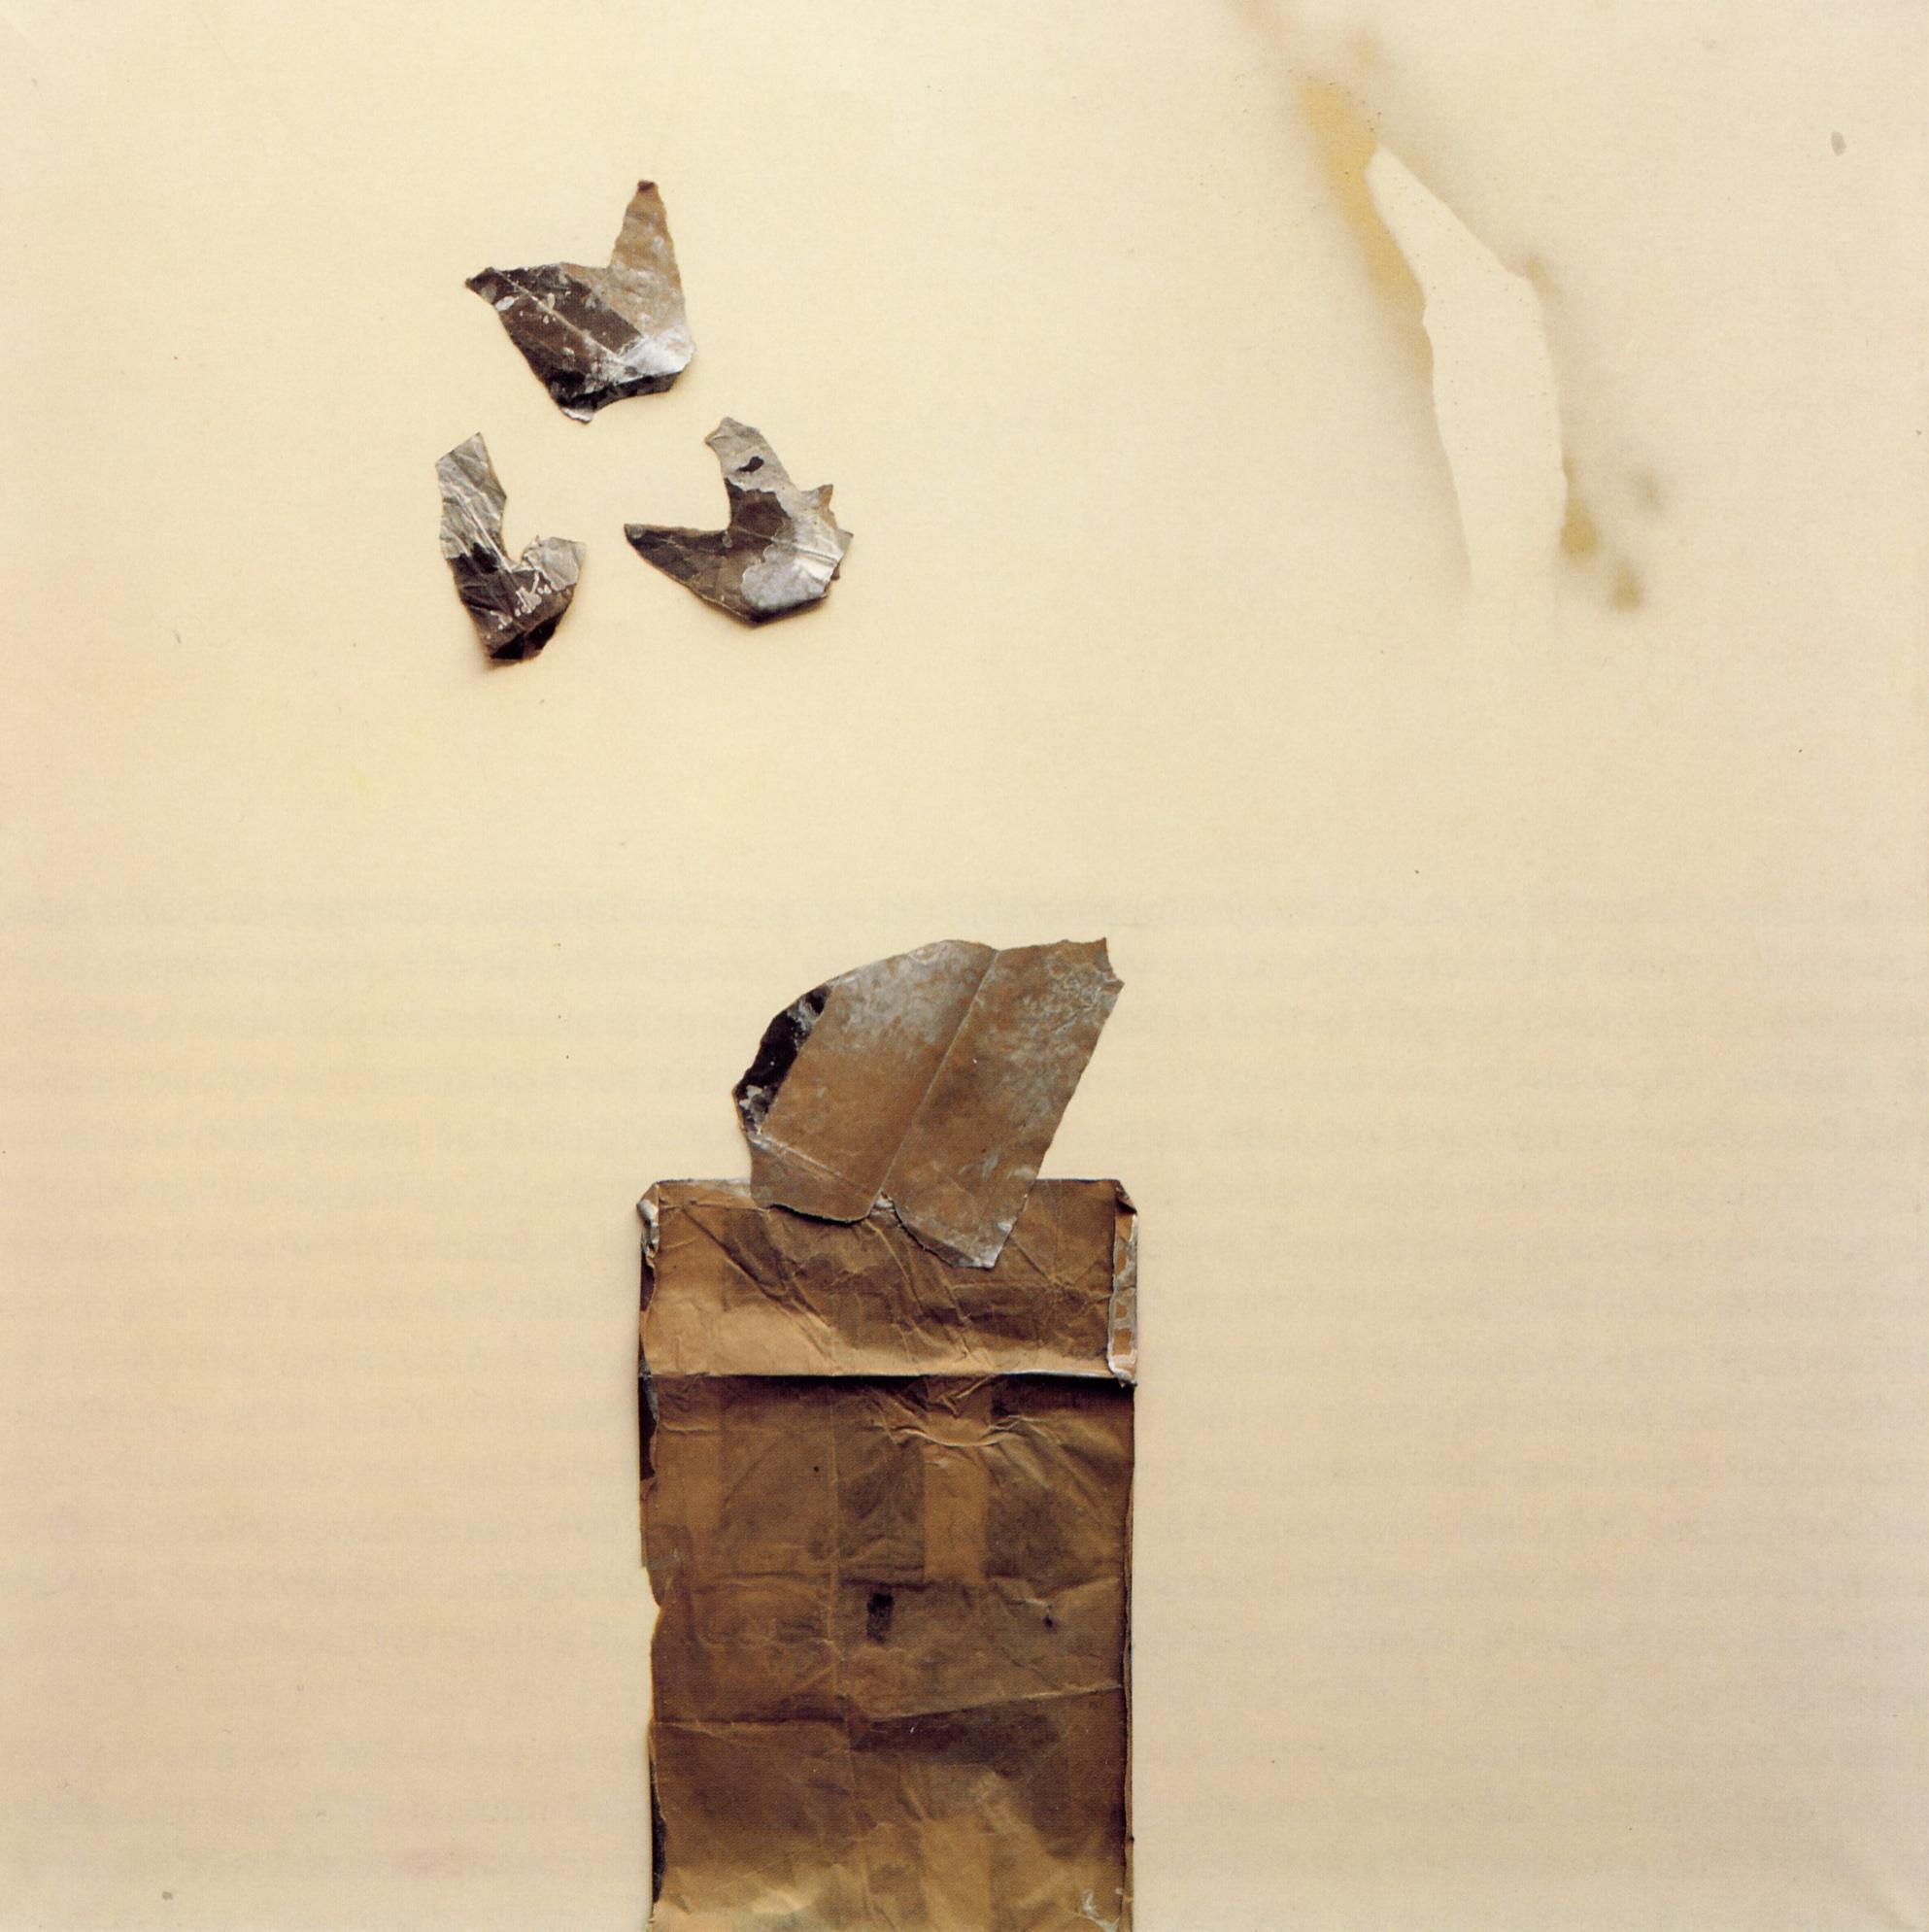 senza titolo, 1982, polimaterico su tela, cm 190 x 190  untitled, 1982, mixed media on canvas, cm 190 x 190